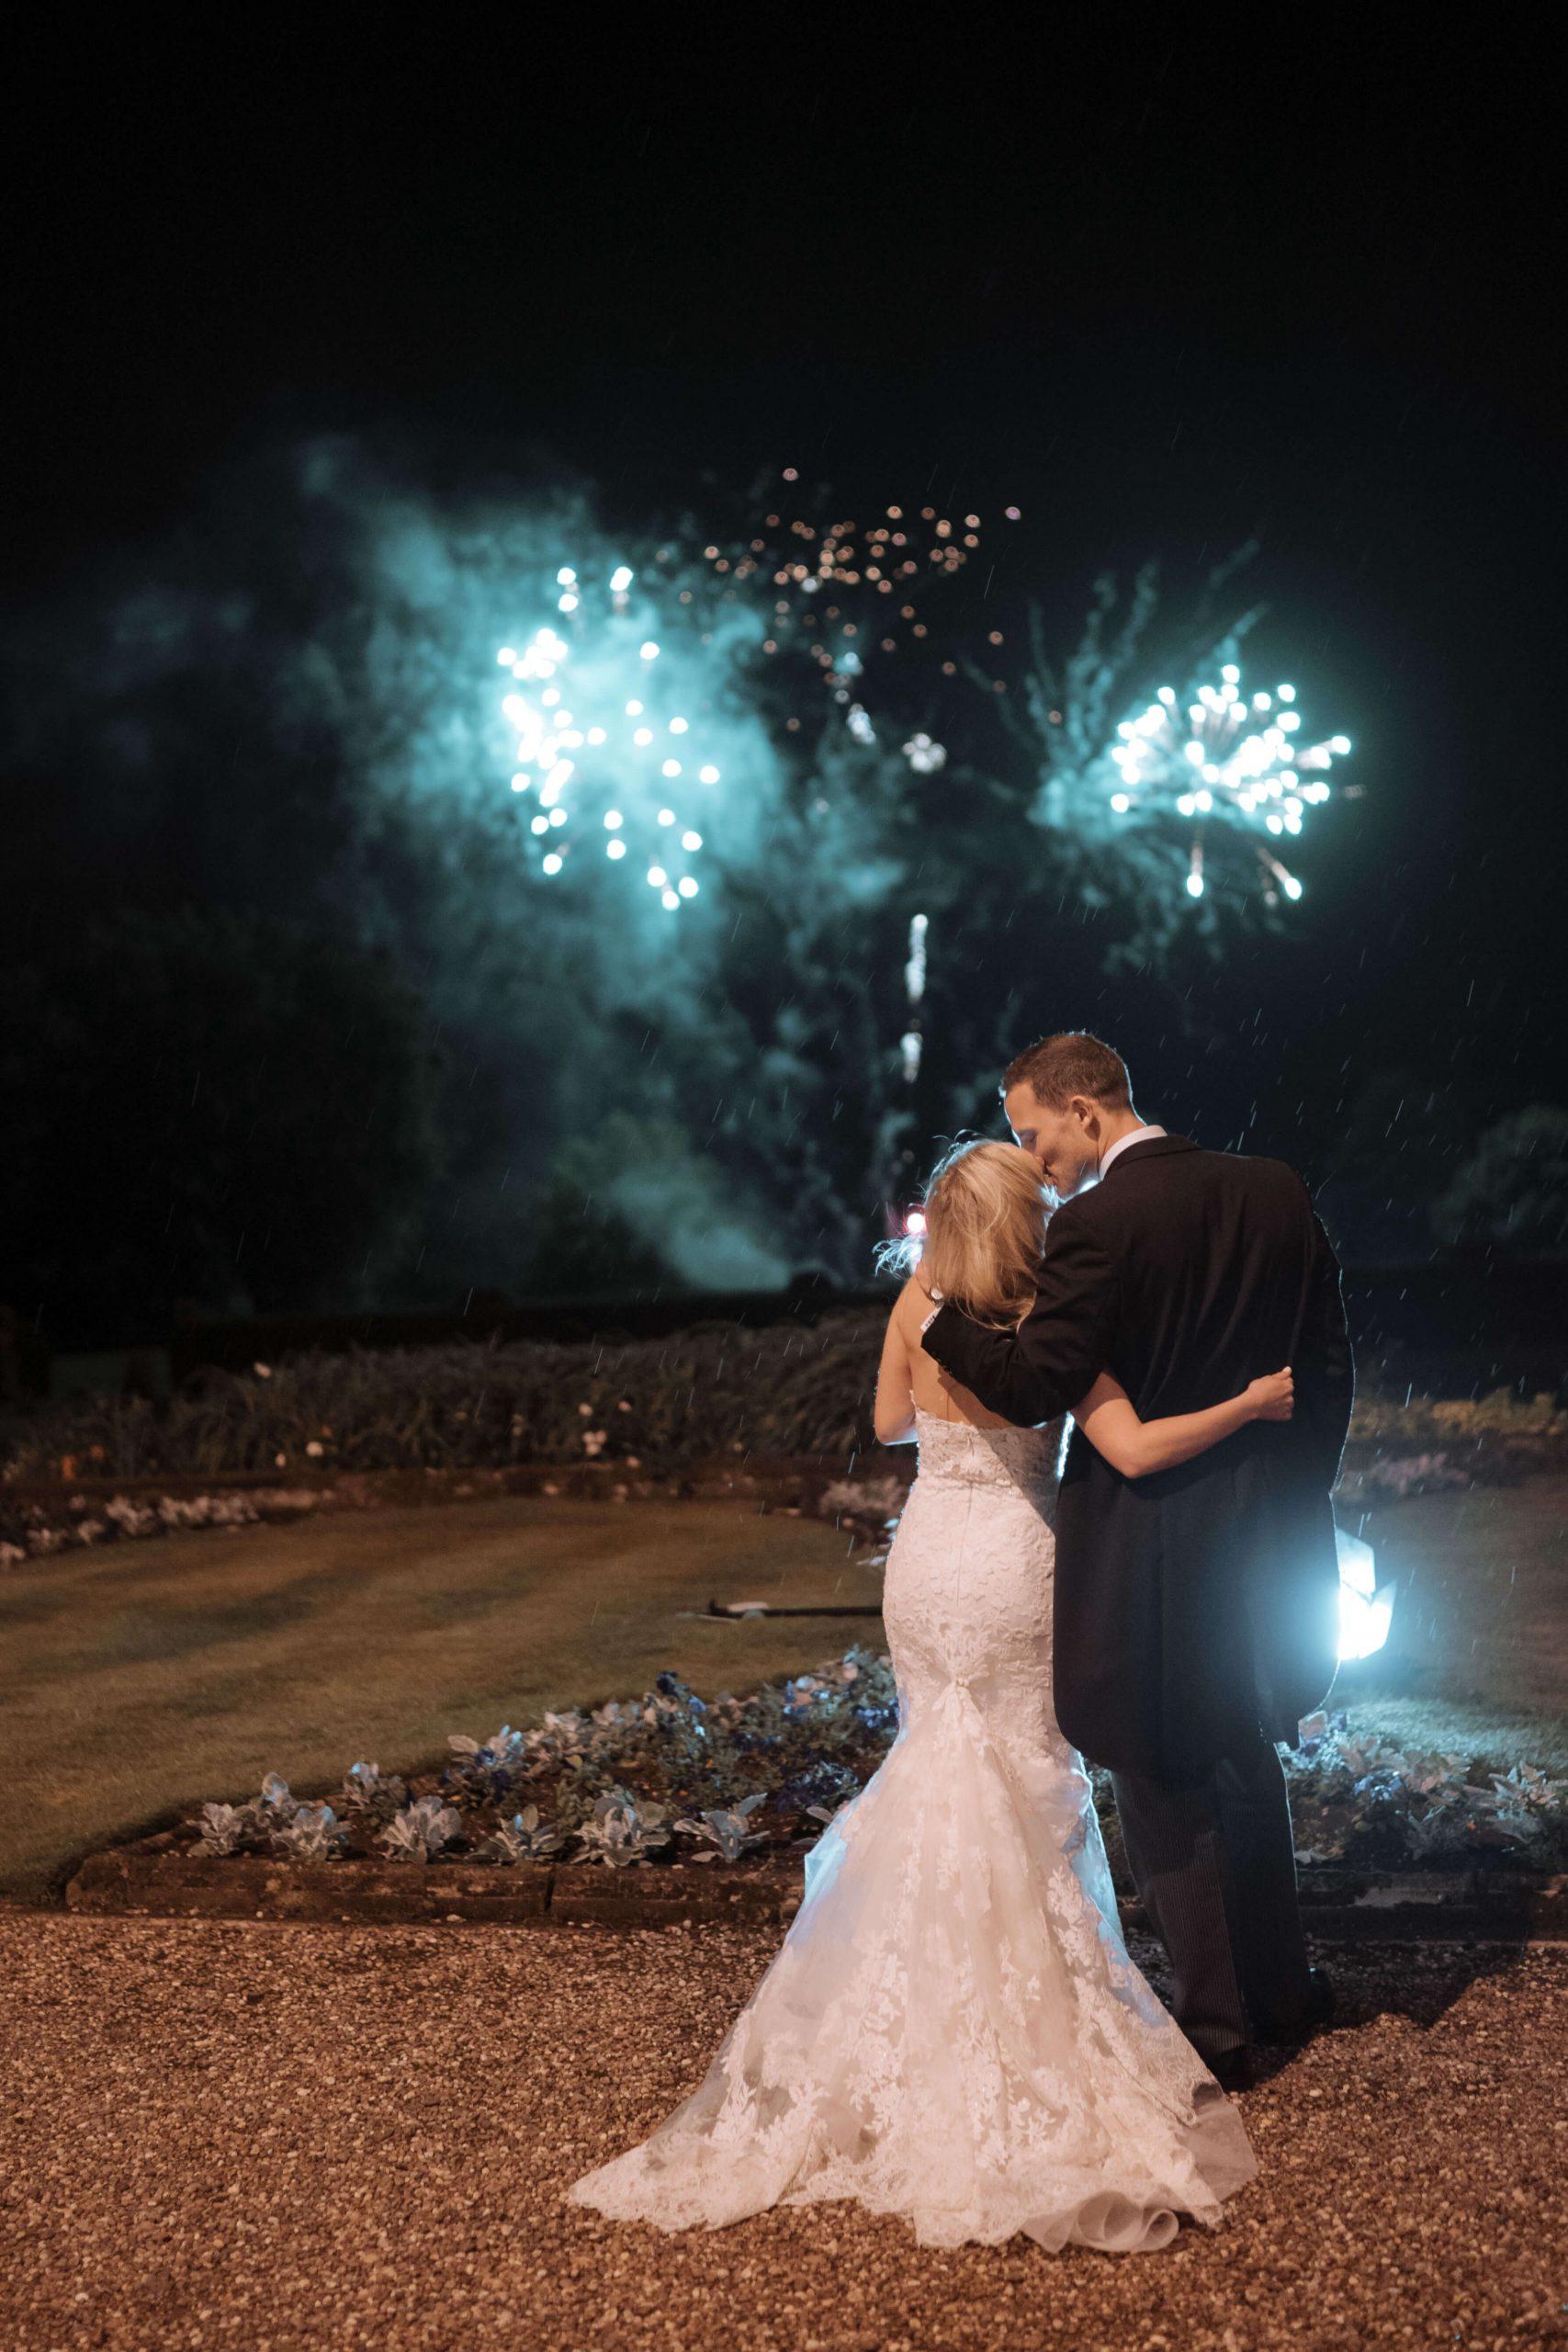 wedding-photographer-and-videographer-Weston-park-11